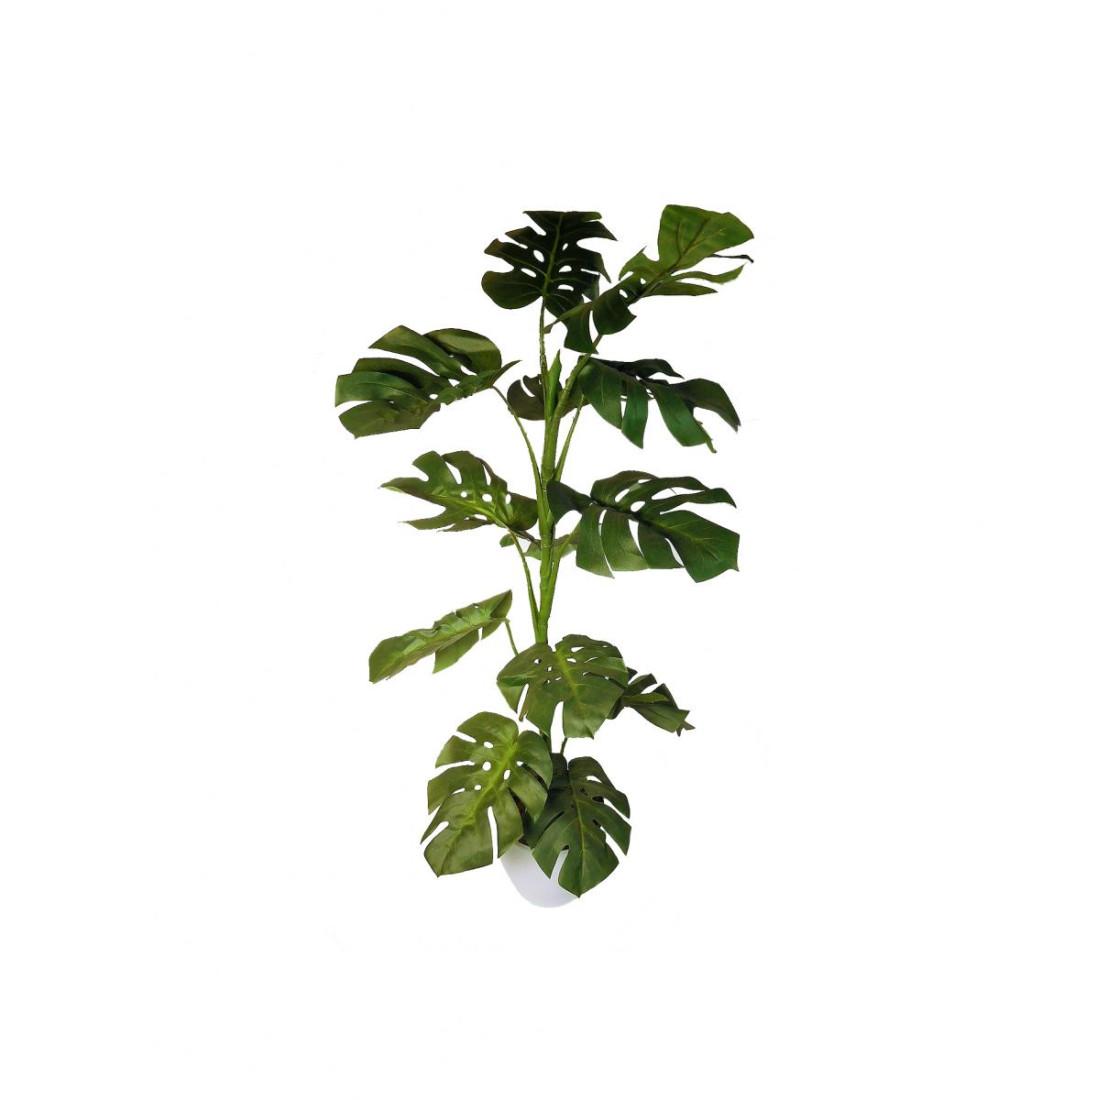 Monstera Kunstpflanze künstlich Pflanze Kunstblume 110 cm TC-83395-2 Topf F75